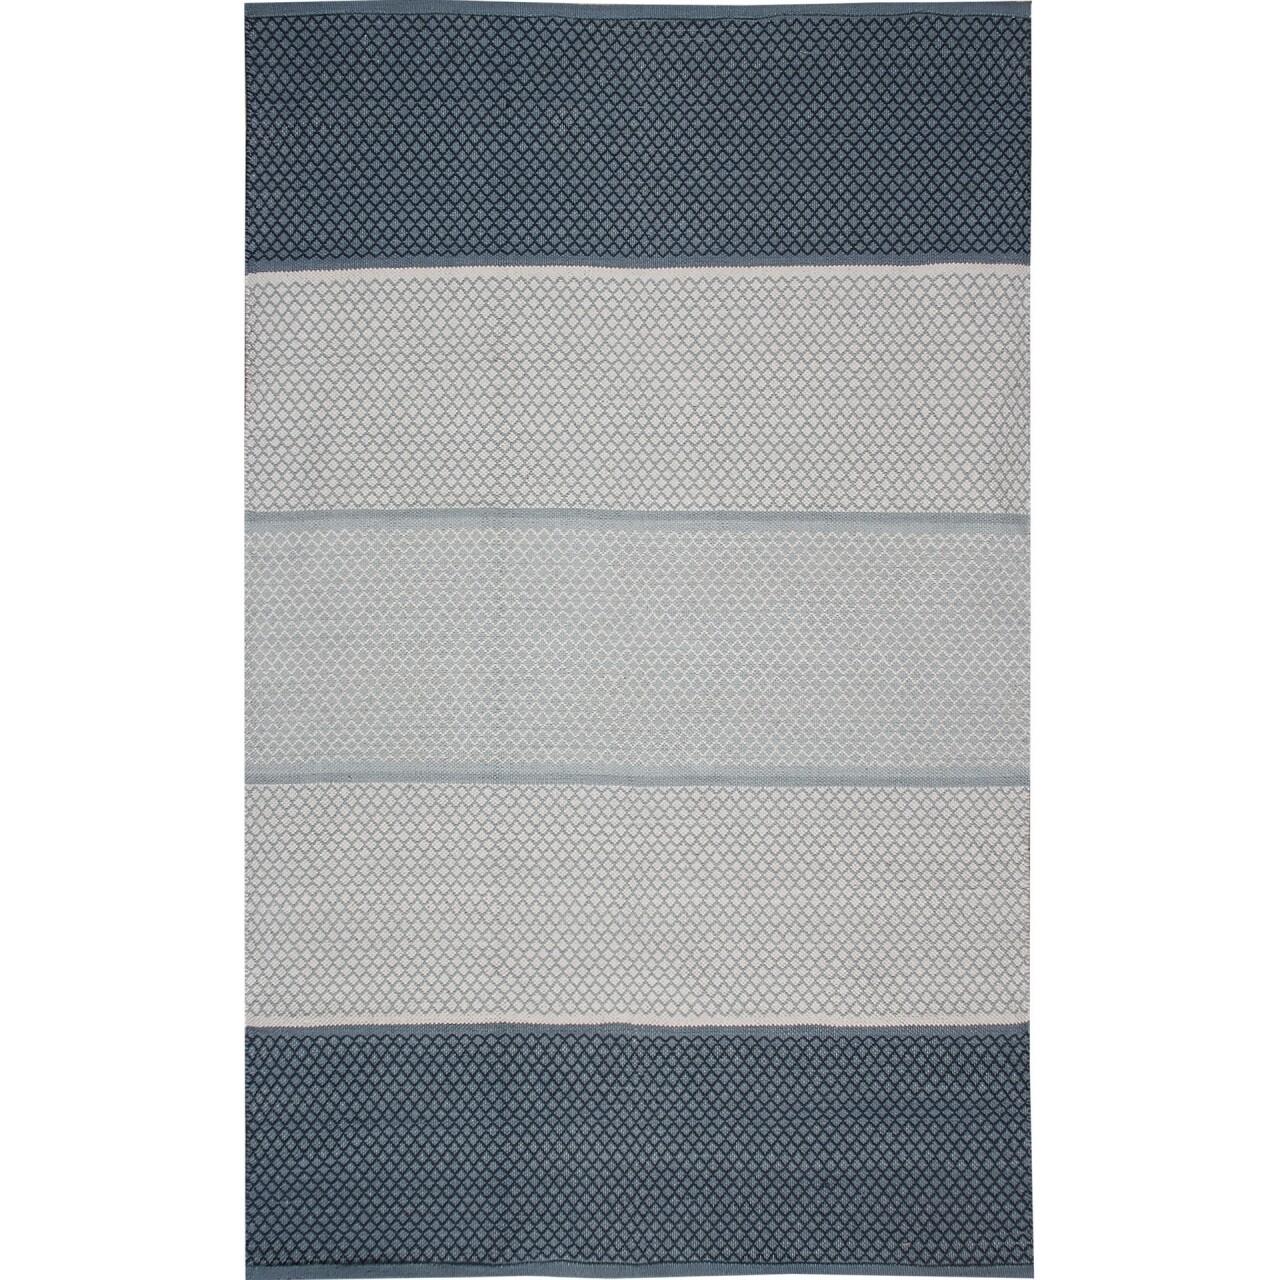 Covor rezistent Eko, 9025 - Grey, 100% bumbac,  120 x 180 cm